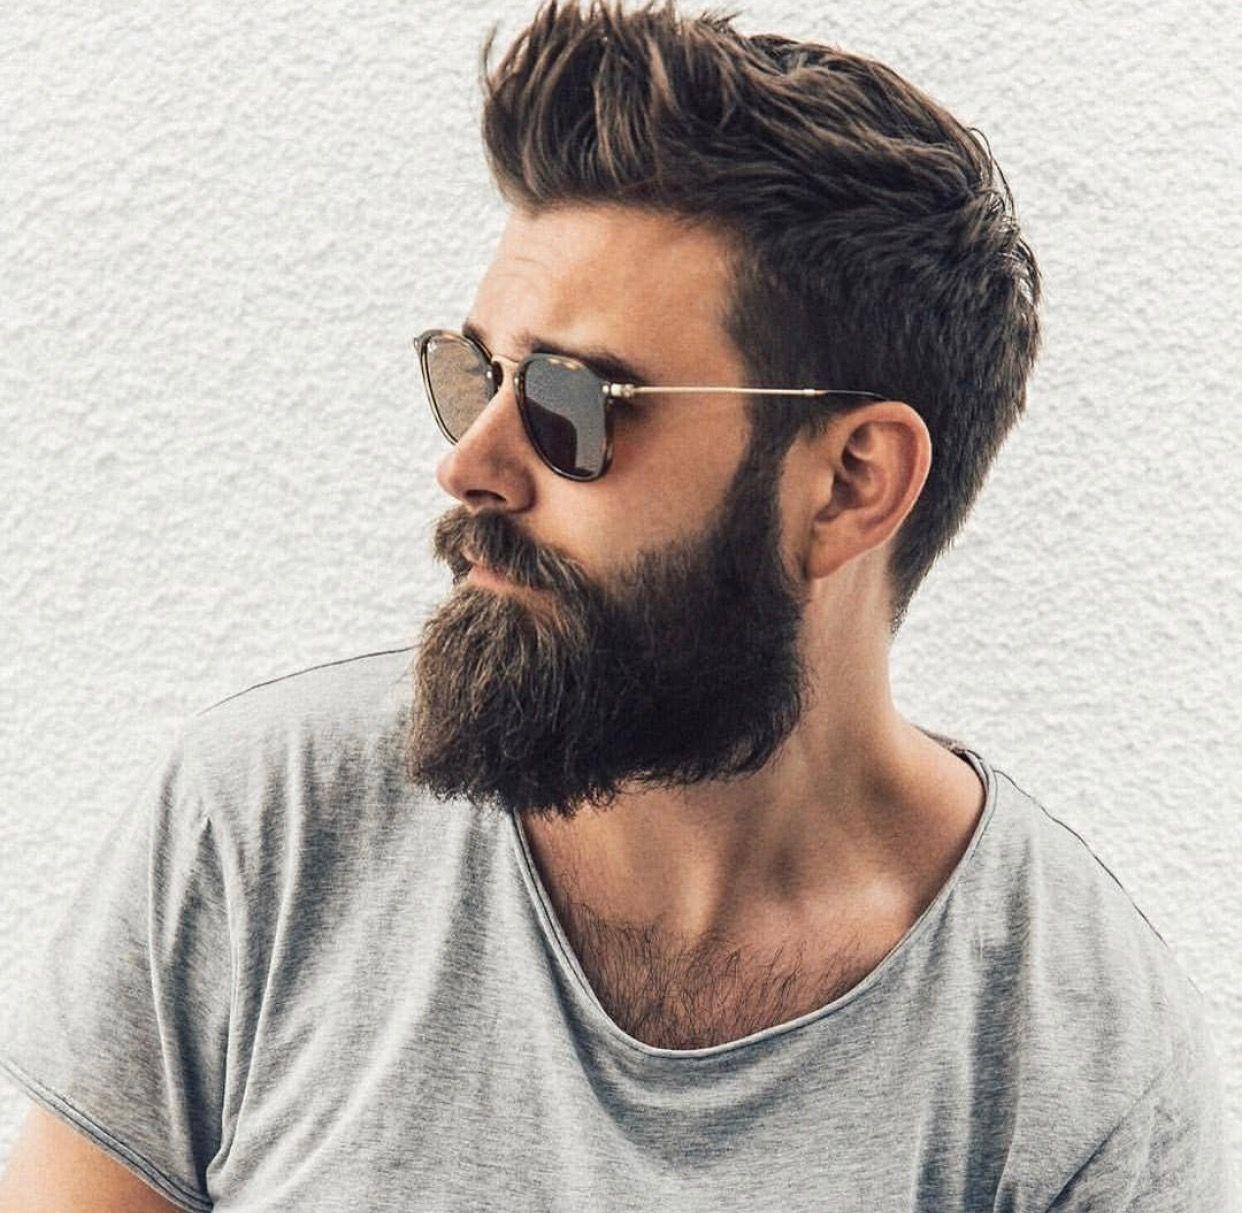 Trendy men haircuts pin by az on beard style  pinterest  haircuts man hair and beard